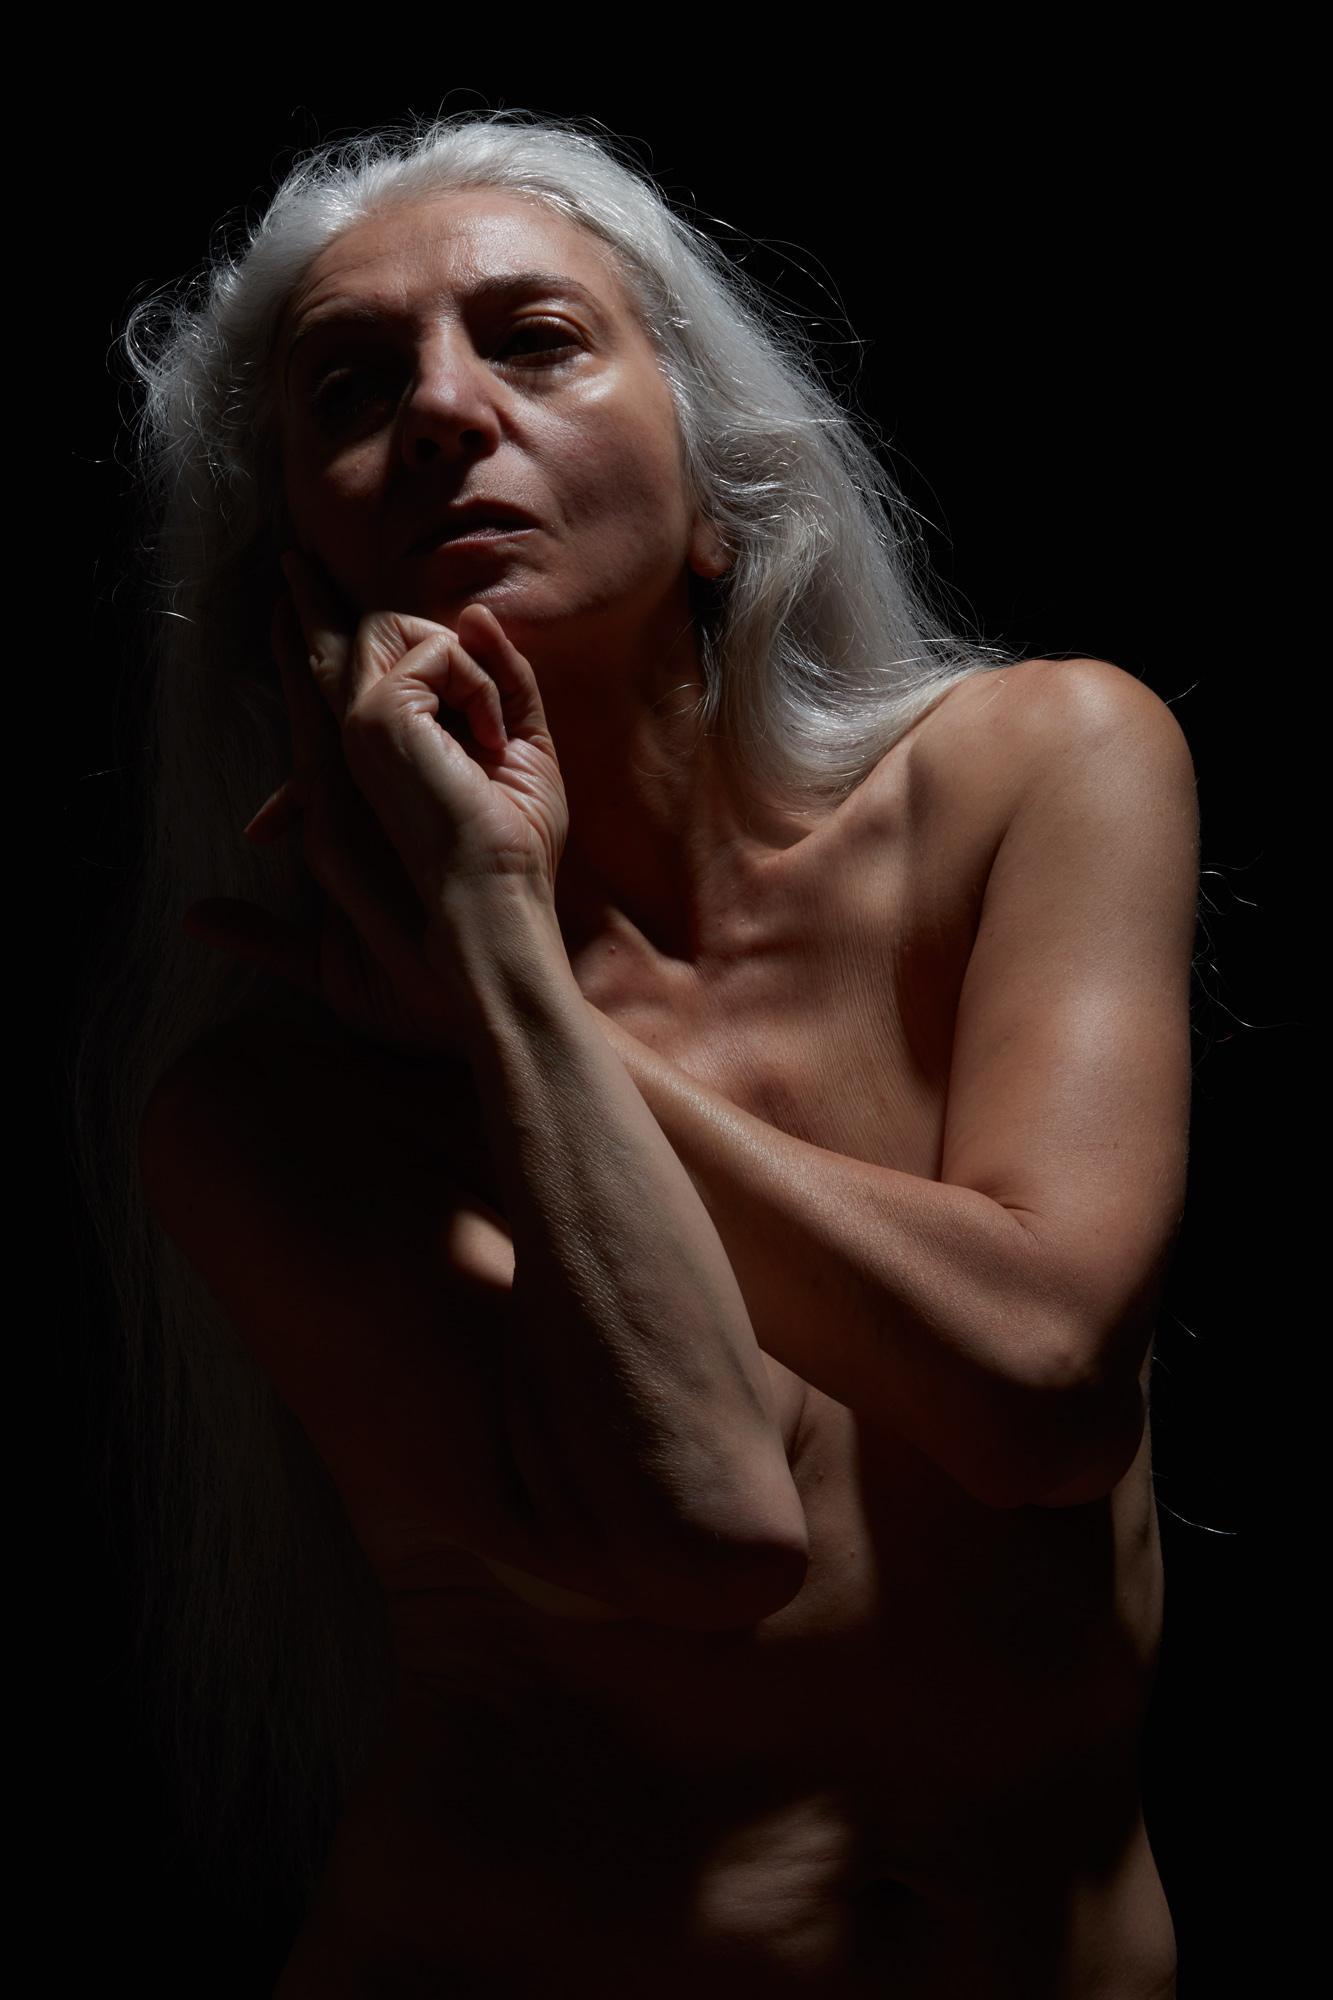 mature nude model Free